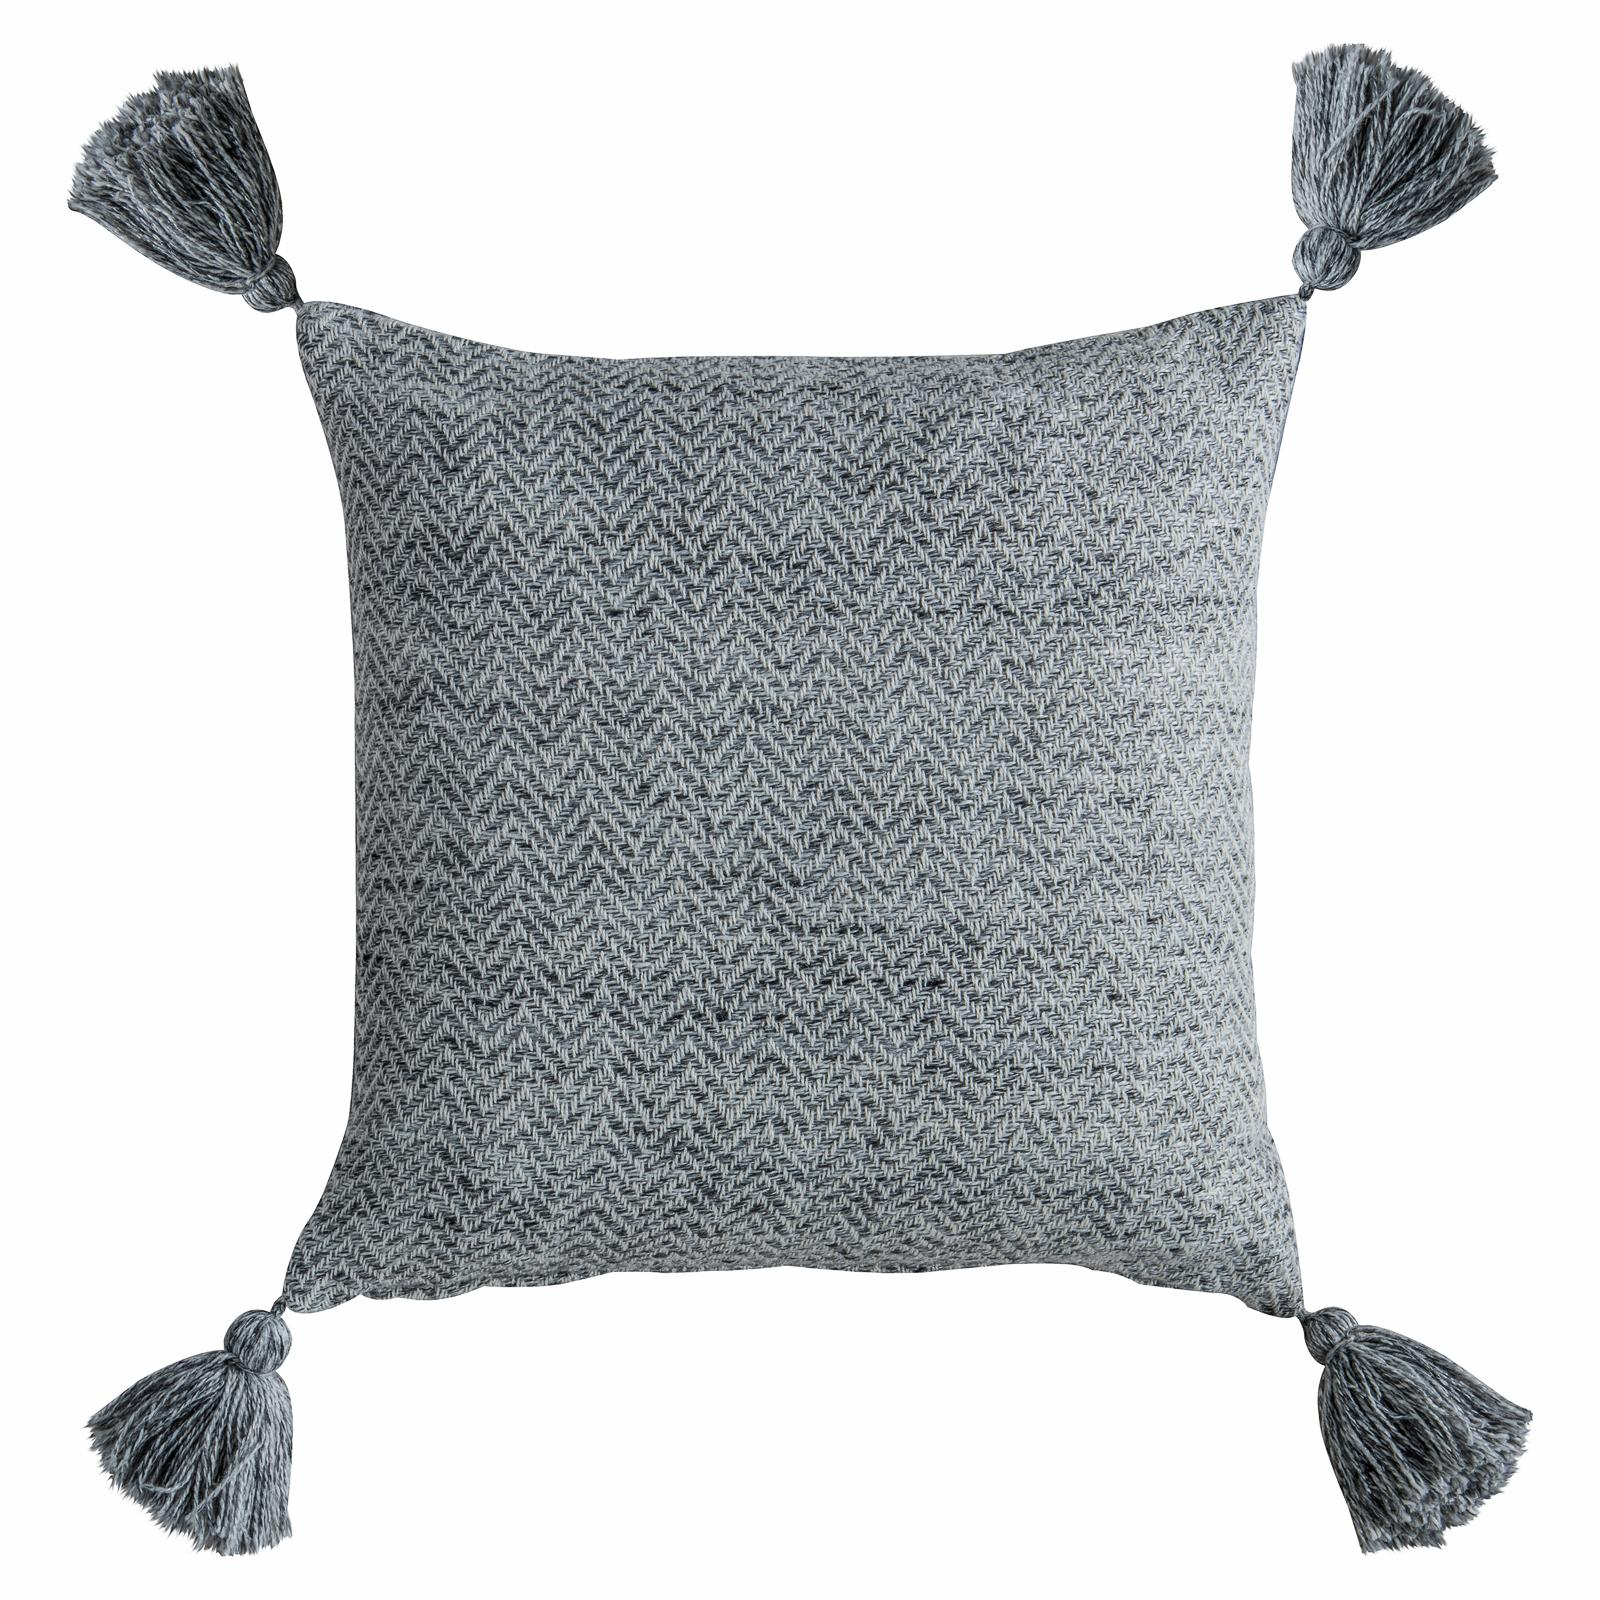 Simmoons 450 x 450mm Charcoal Herringbone PET Tassel Cushion